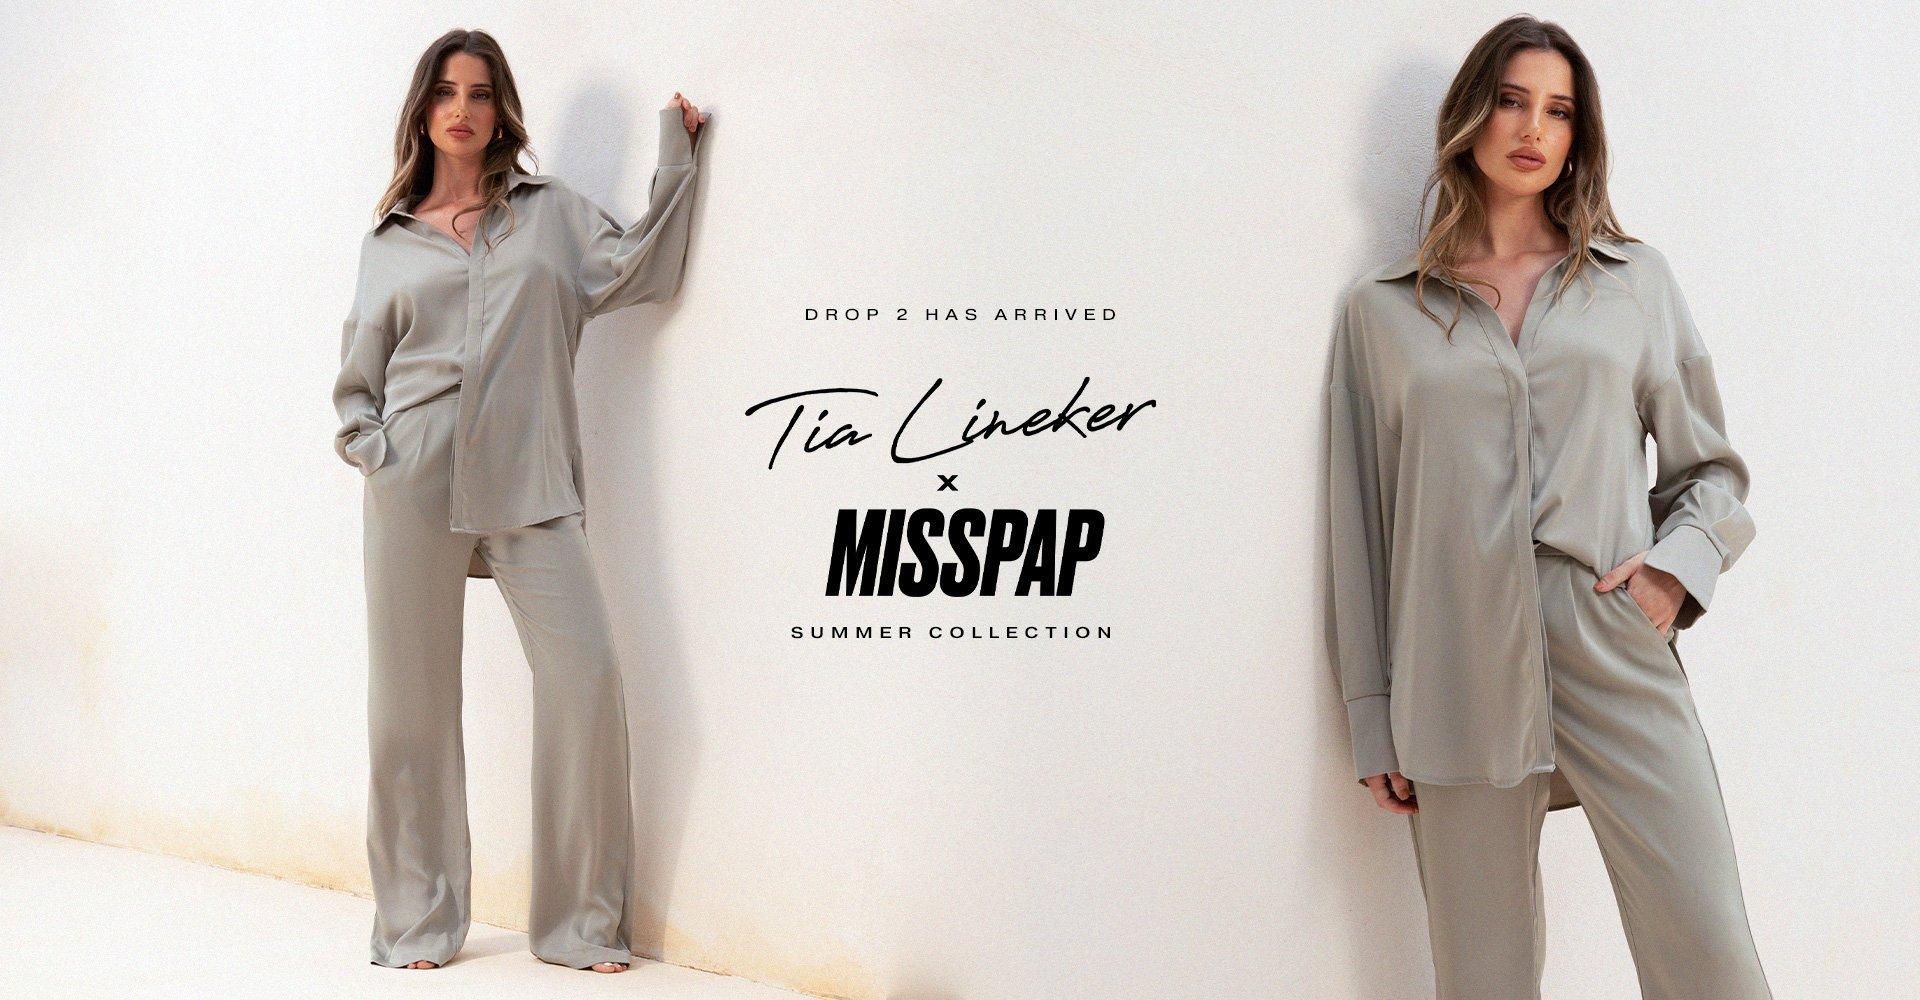 Tia Lineker x Misspap Drop 2